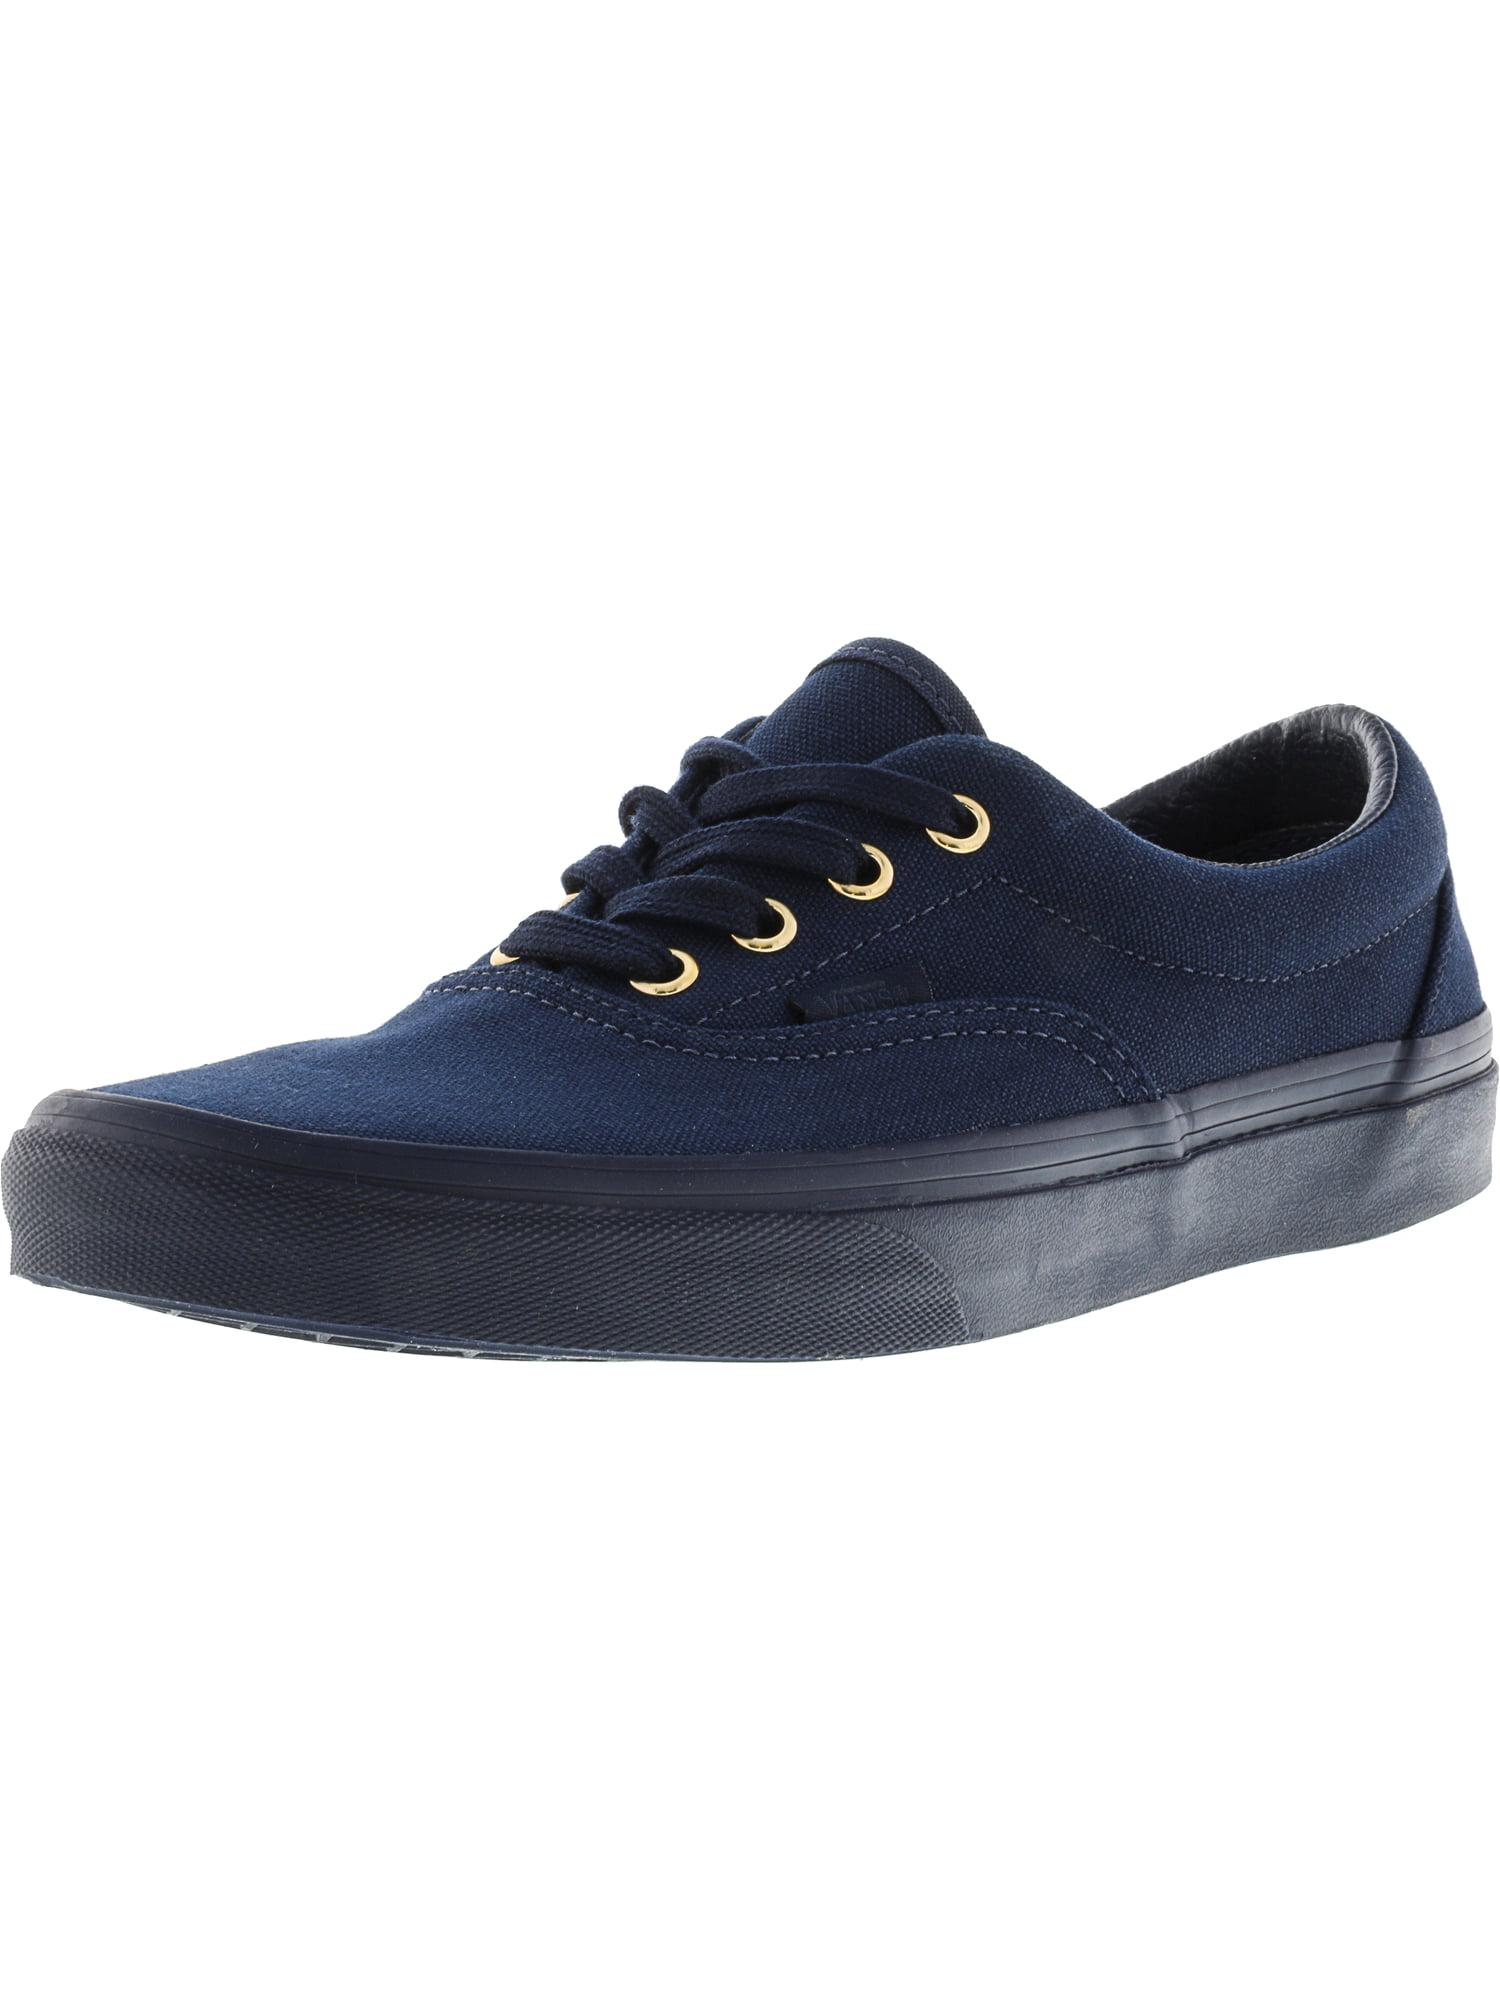 Vans Era Gold Mono Dress Blues Ankle